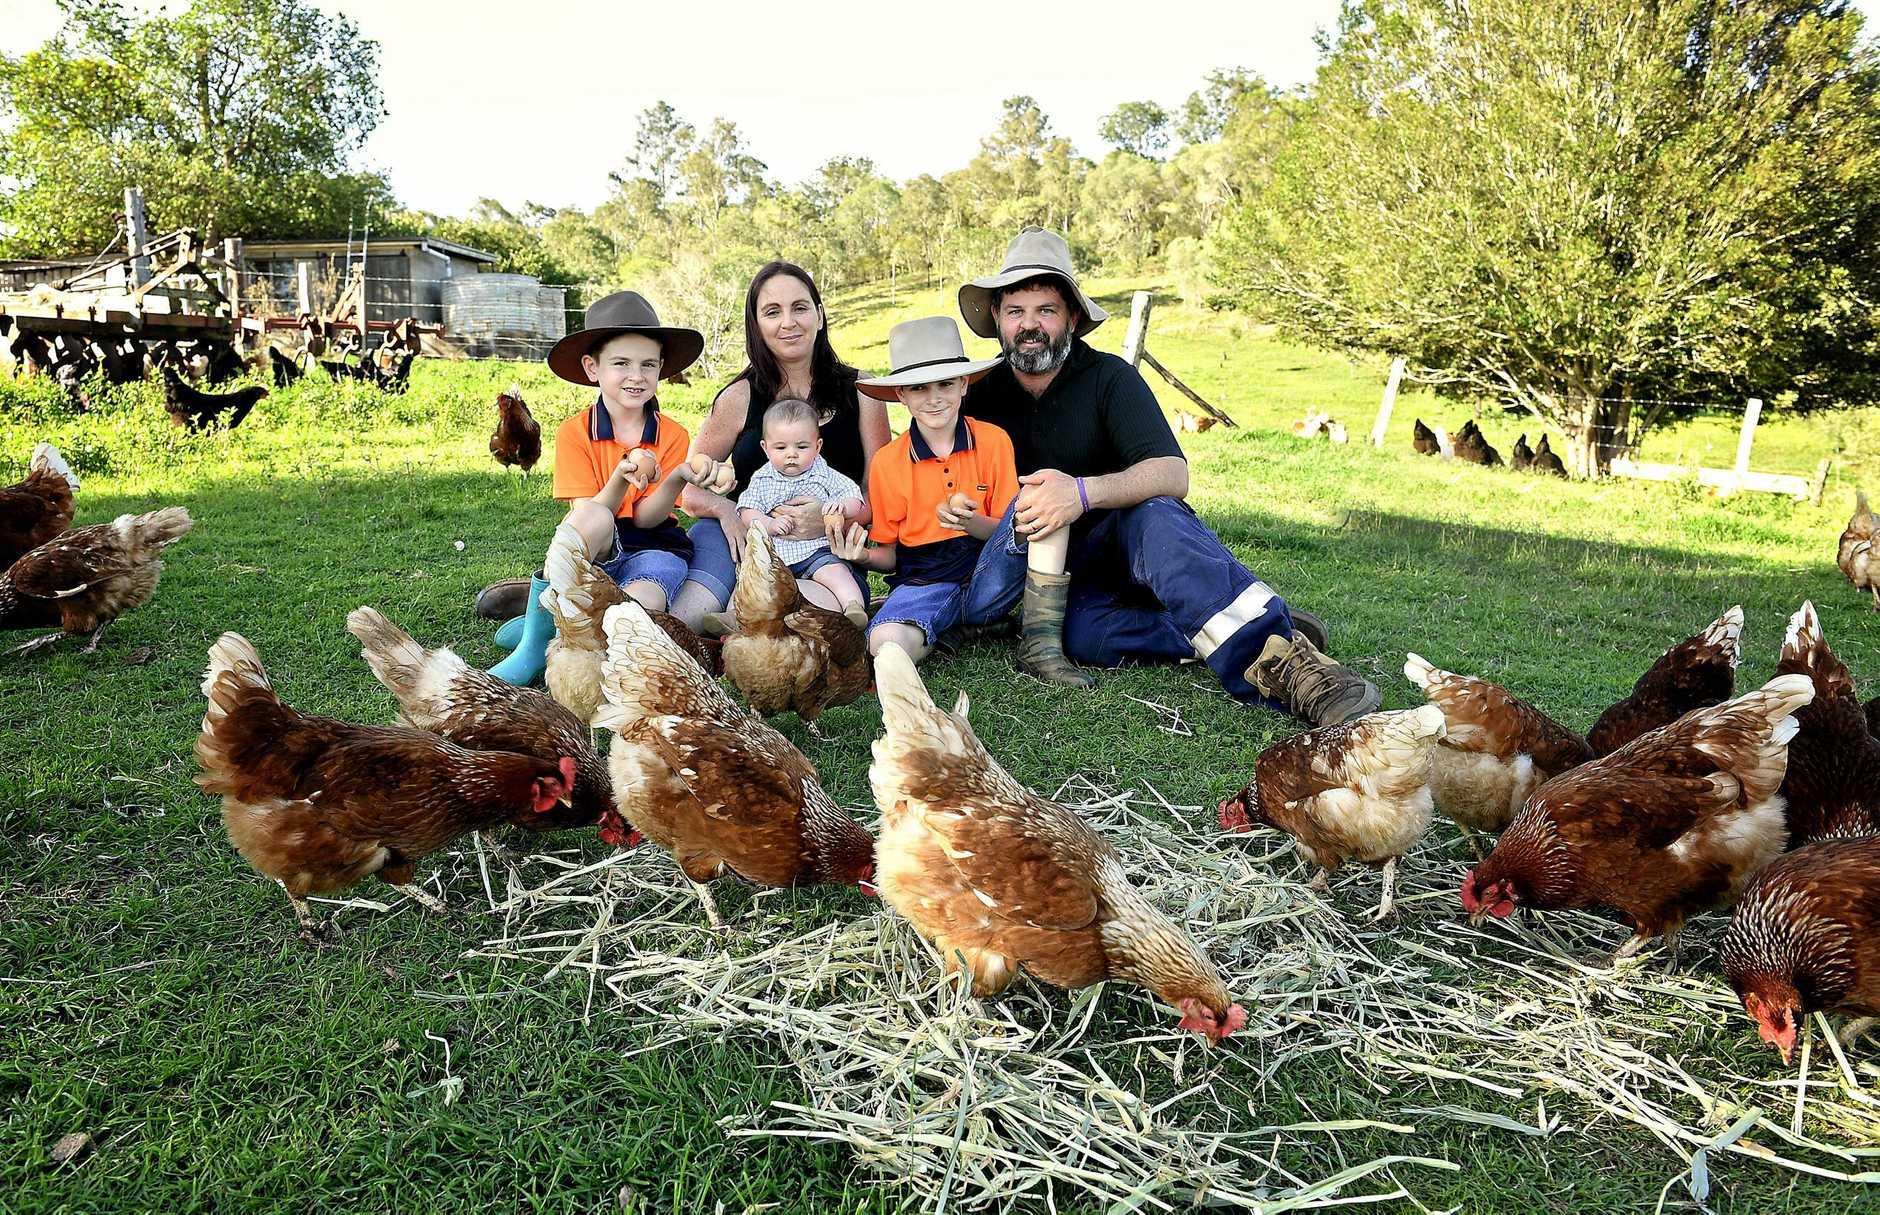 Elijah, Casey with baby William,  Lachlan and Bradley Holt on their free range chook farm at Glastonbury Gympie.